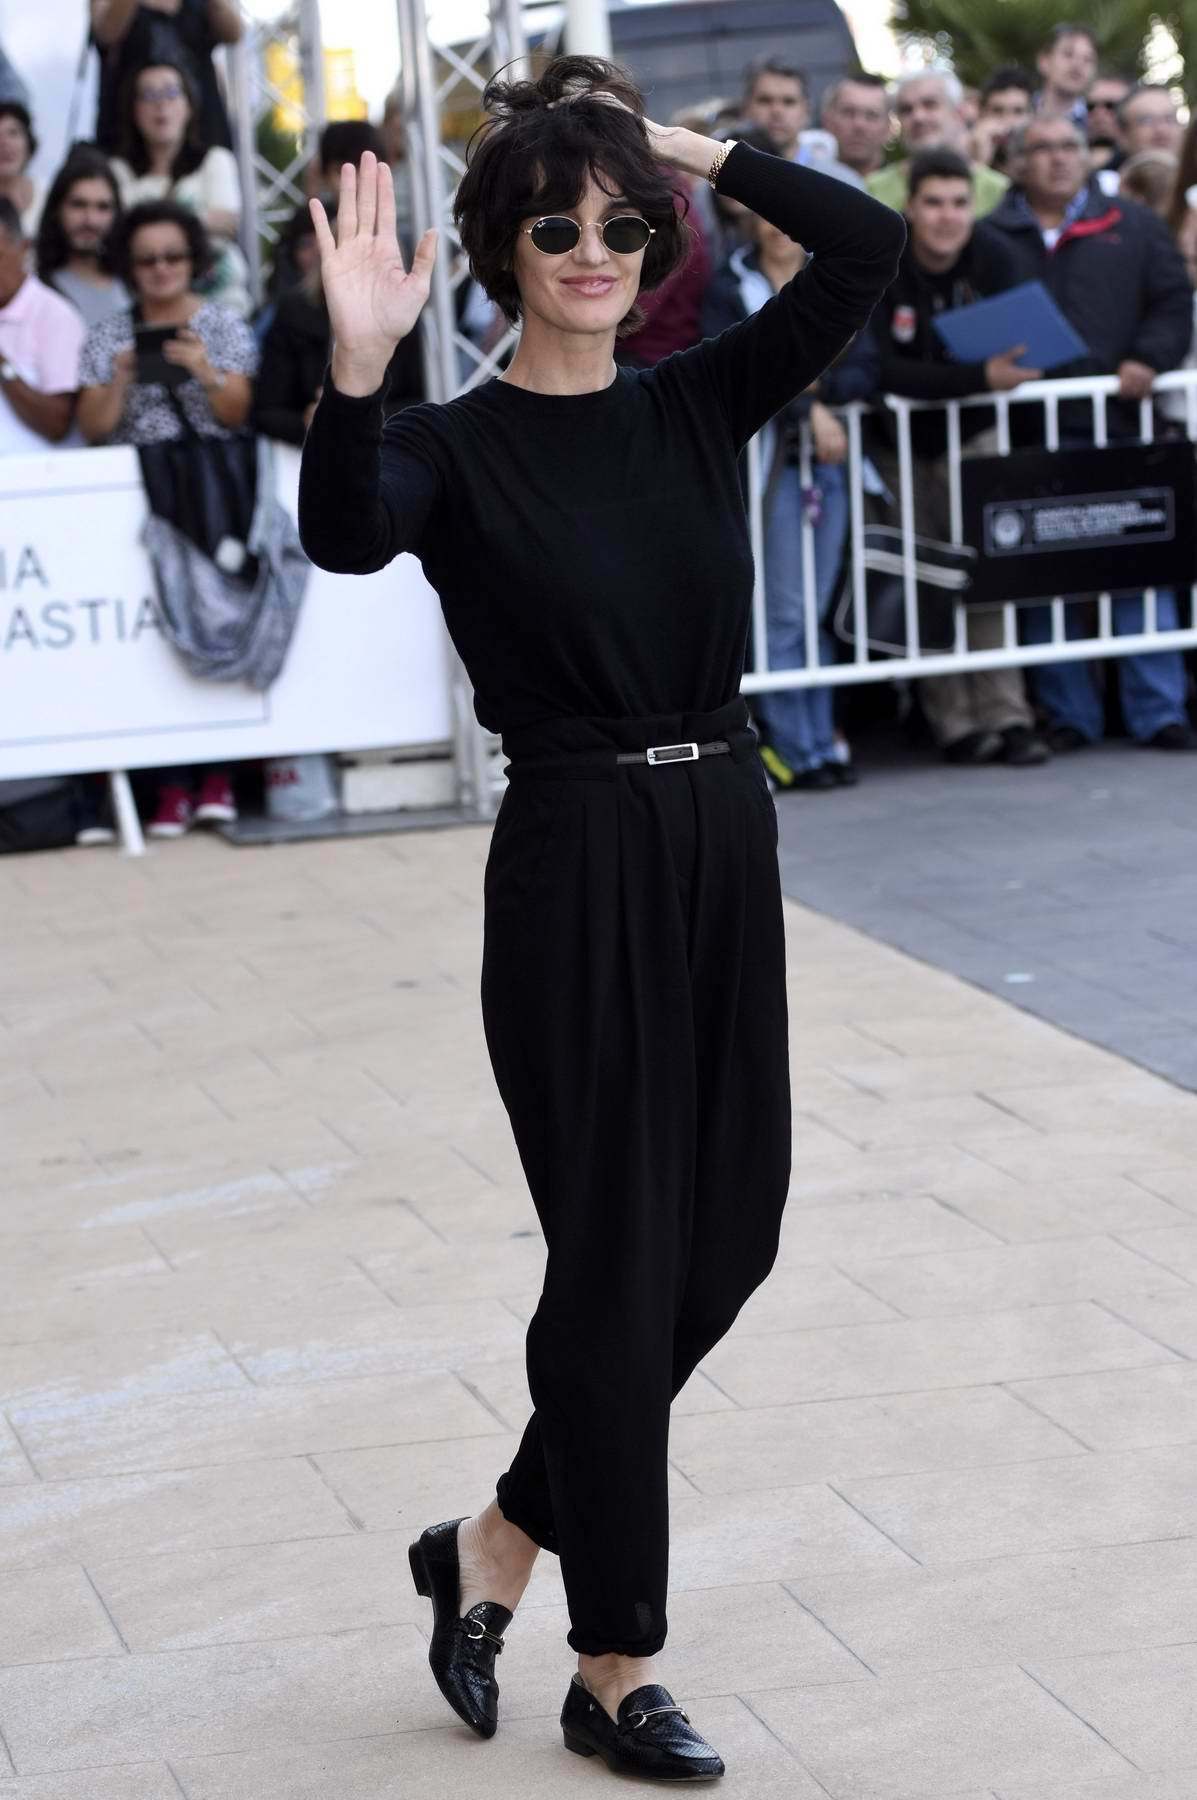 Paz Vega arriving at the Maria Cristina Hotel during the 65th San Sebastian International Film Festival in San Sebastian, Spain